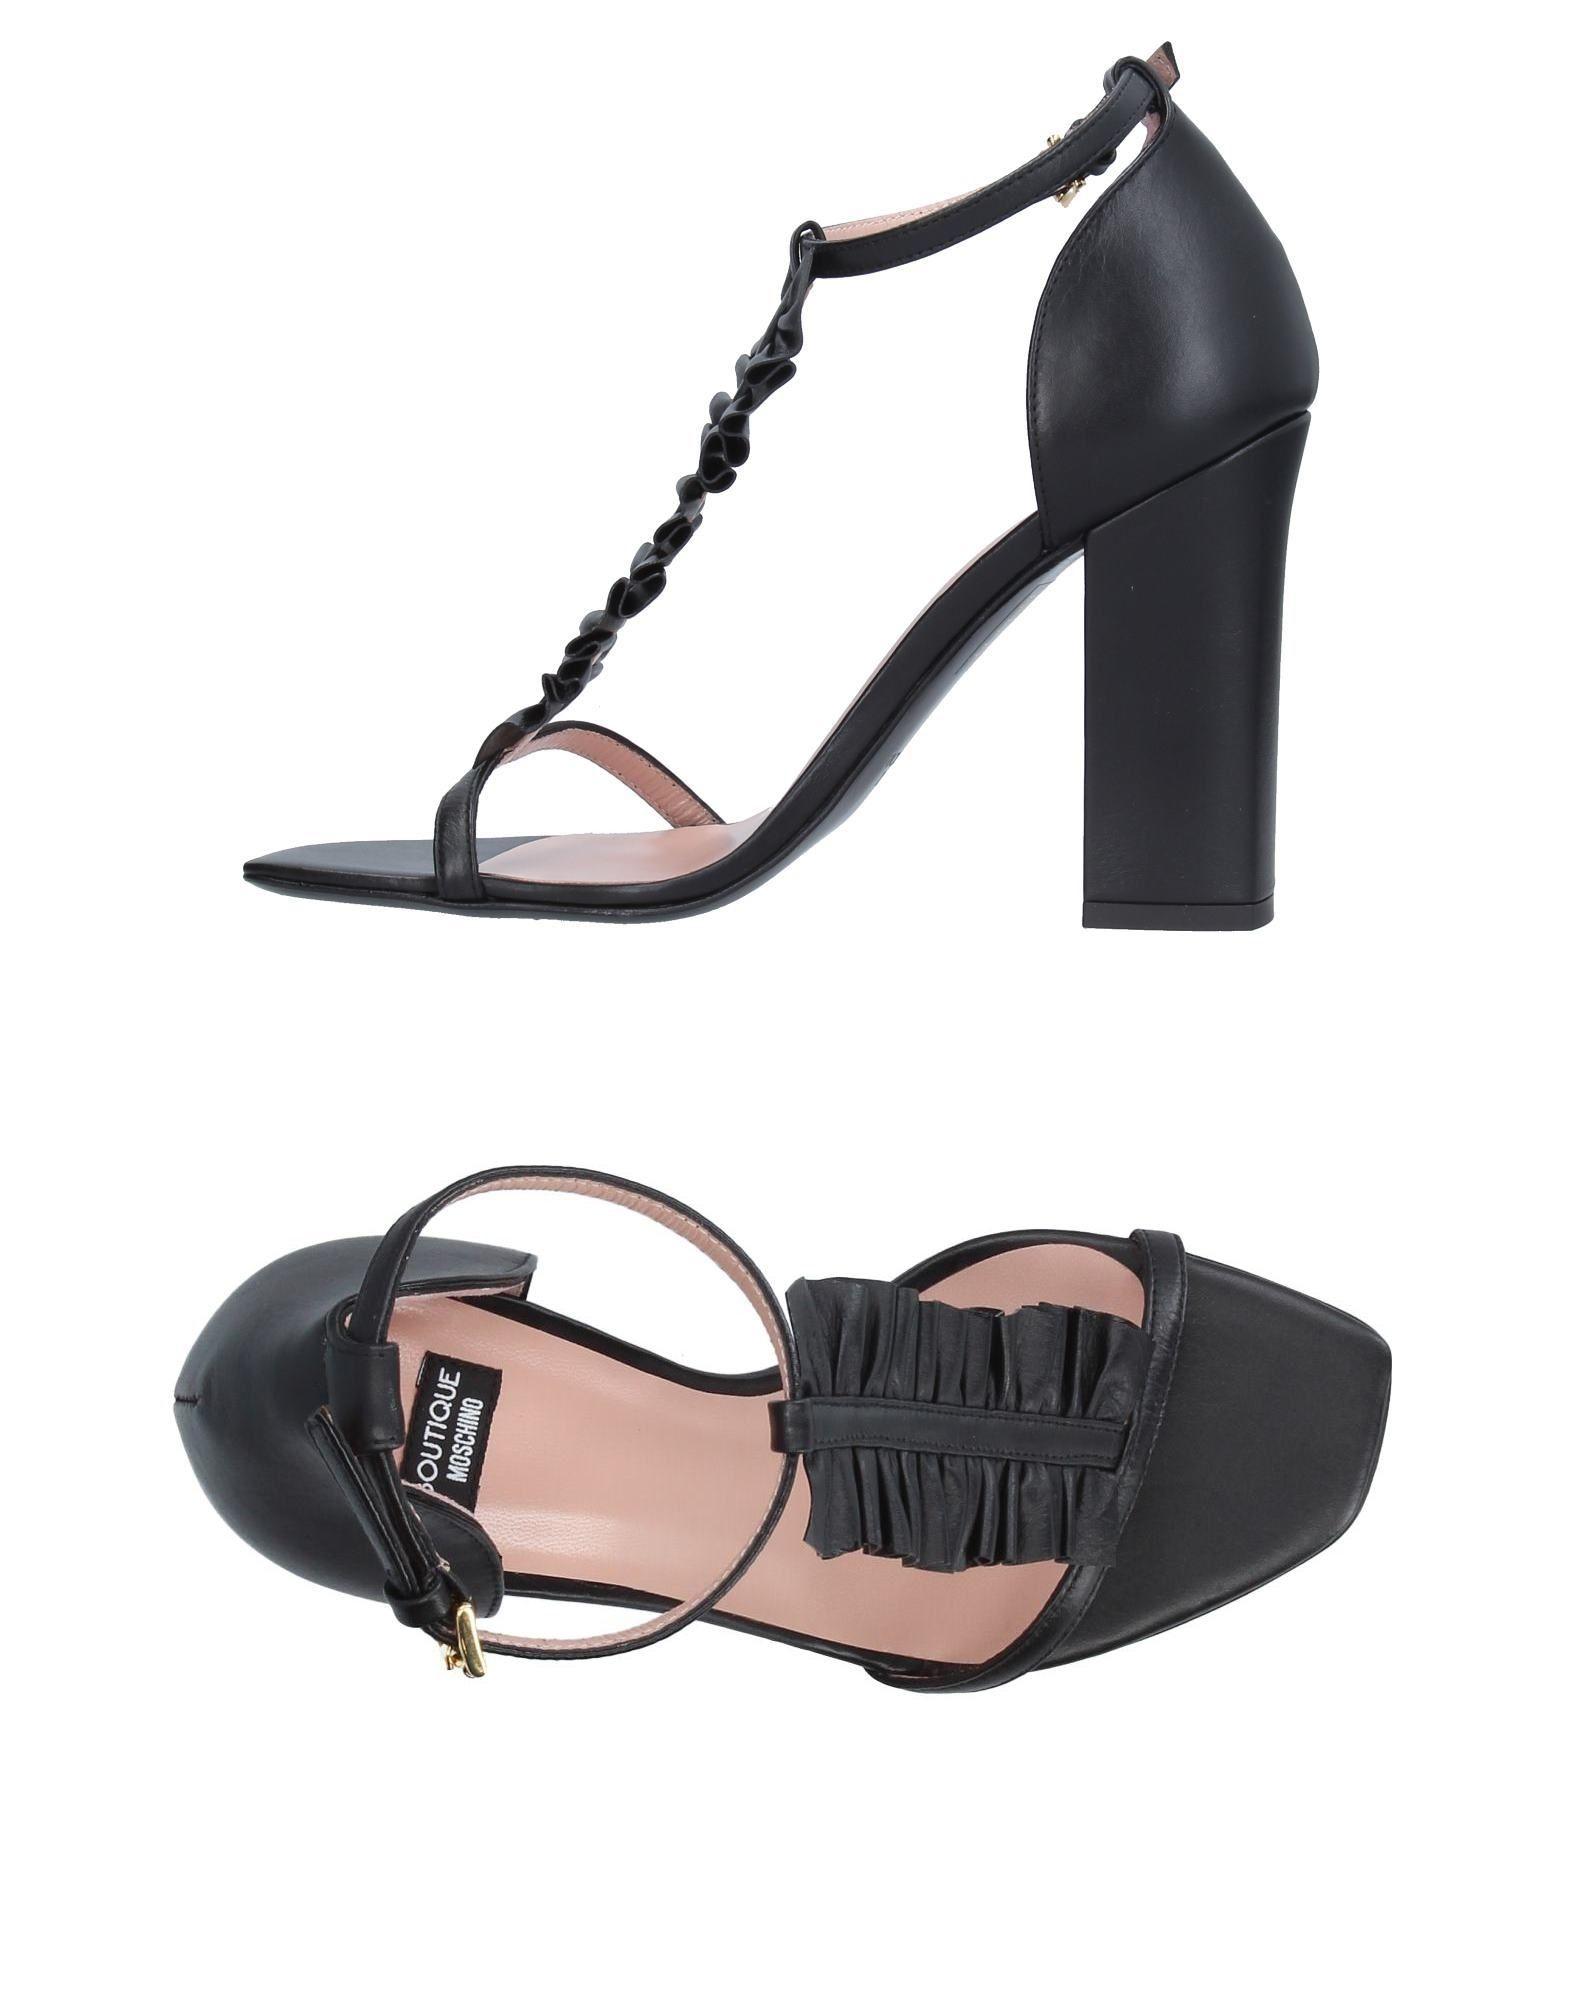 Boutique Moschino Sandalen 11326668PU Damen  11326668PU Sandalen Neue Schuhe 06ab01